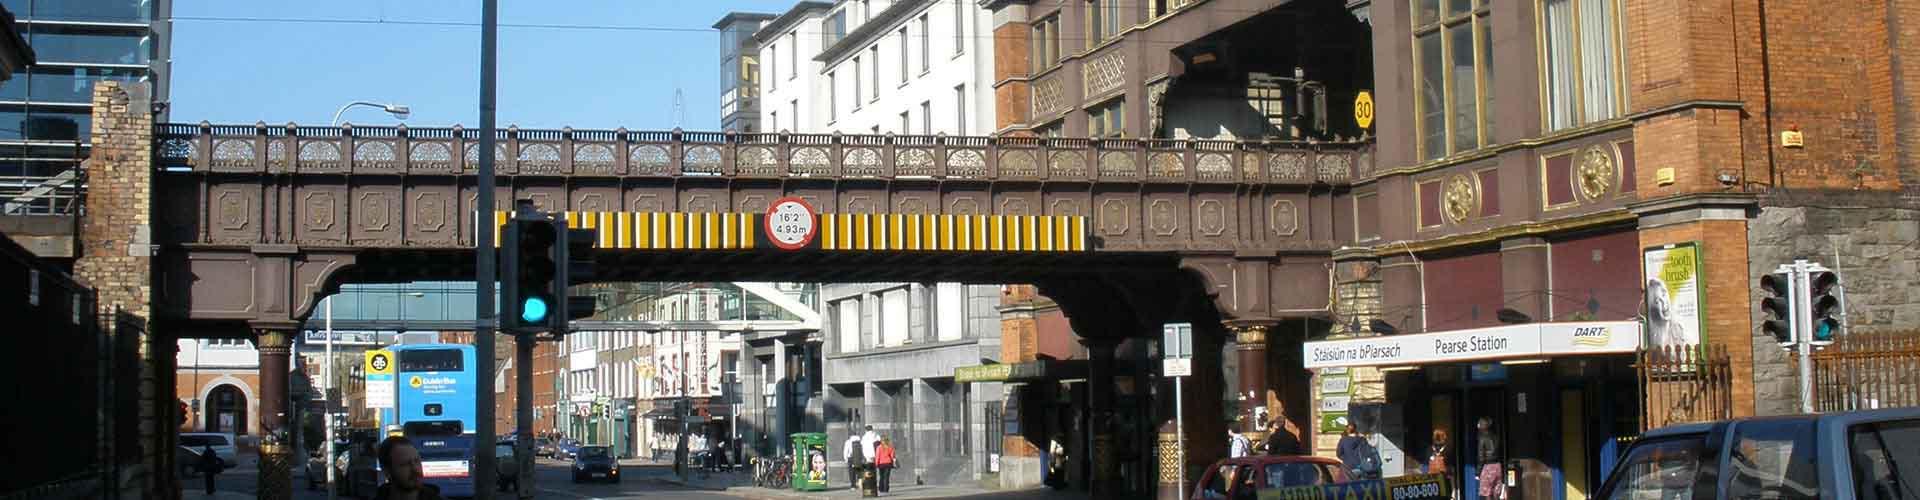 Dublín - Hostales cerca a Dublin Pearse la estación de tren. Mapas de Dublín, Fotos y comentarios de cada Hostal en Dublín.